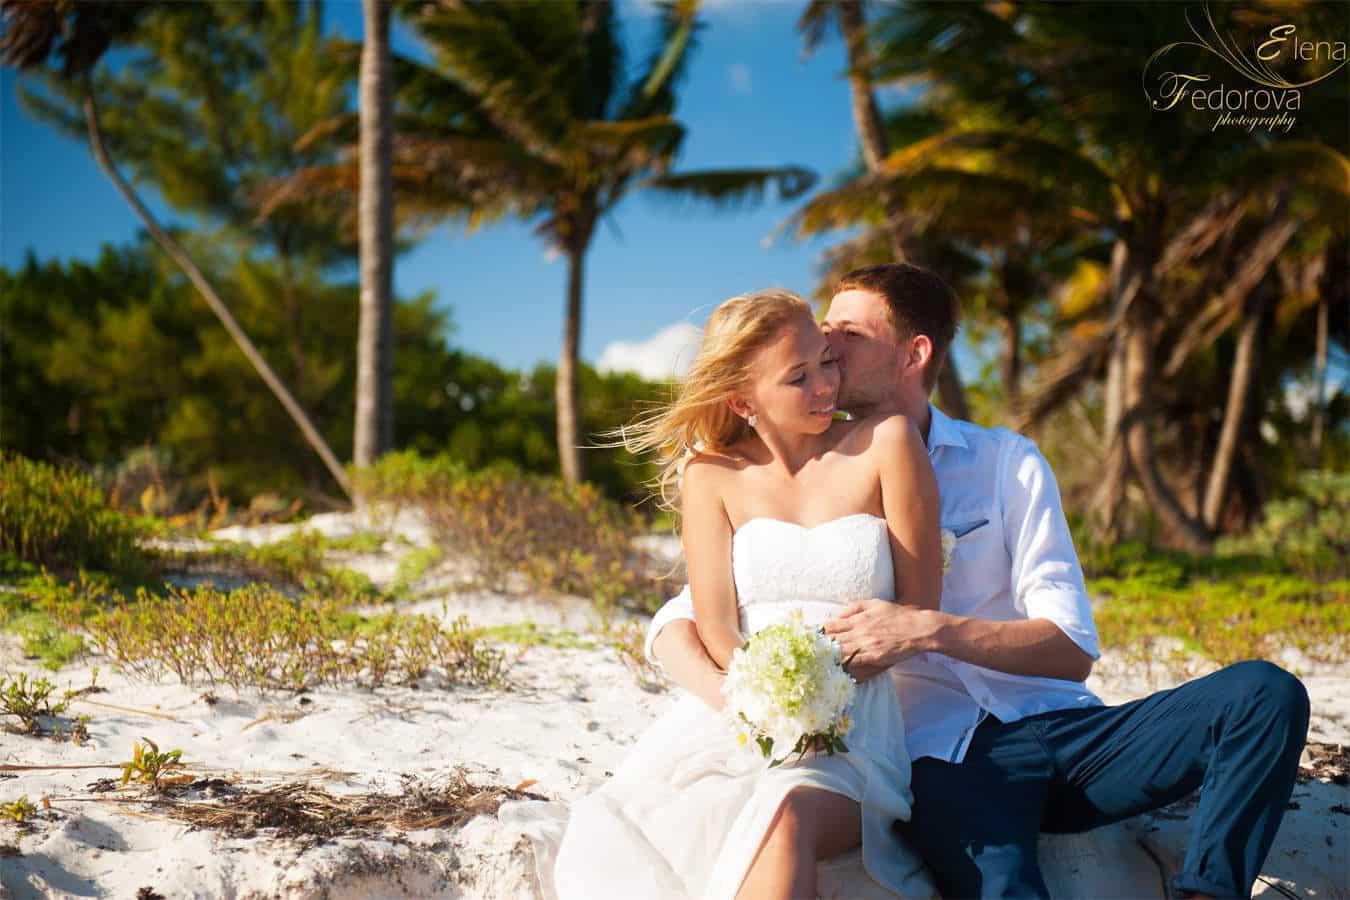 Mayan riviera wedding photographer elena fedorova for Riviera maya wedding photographer